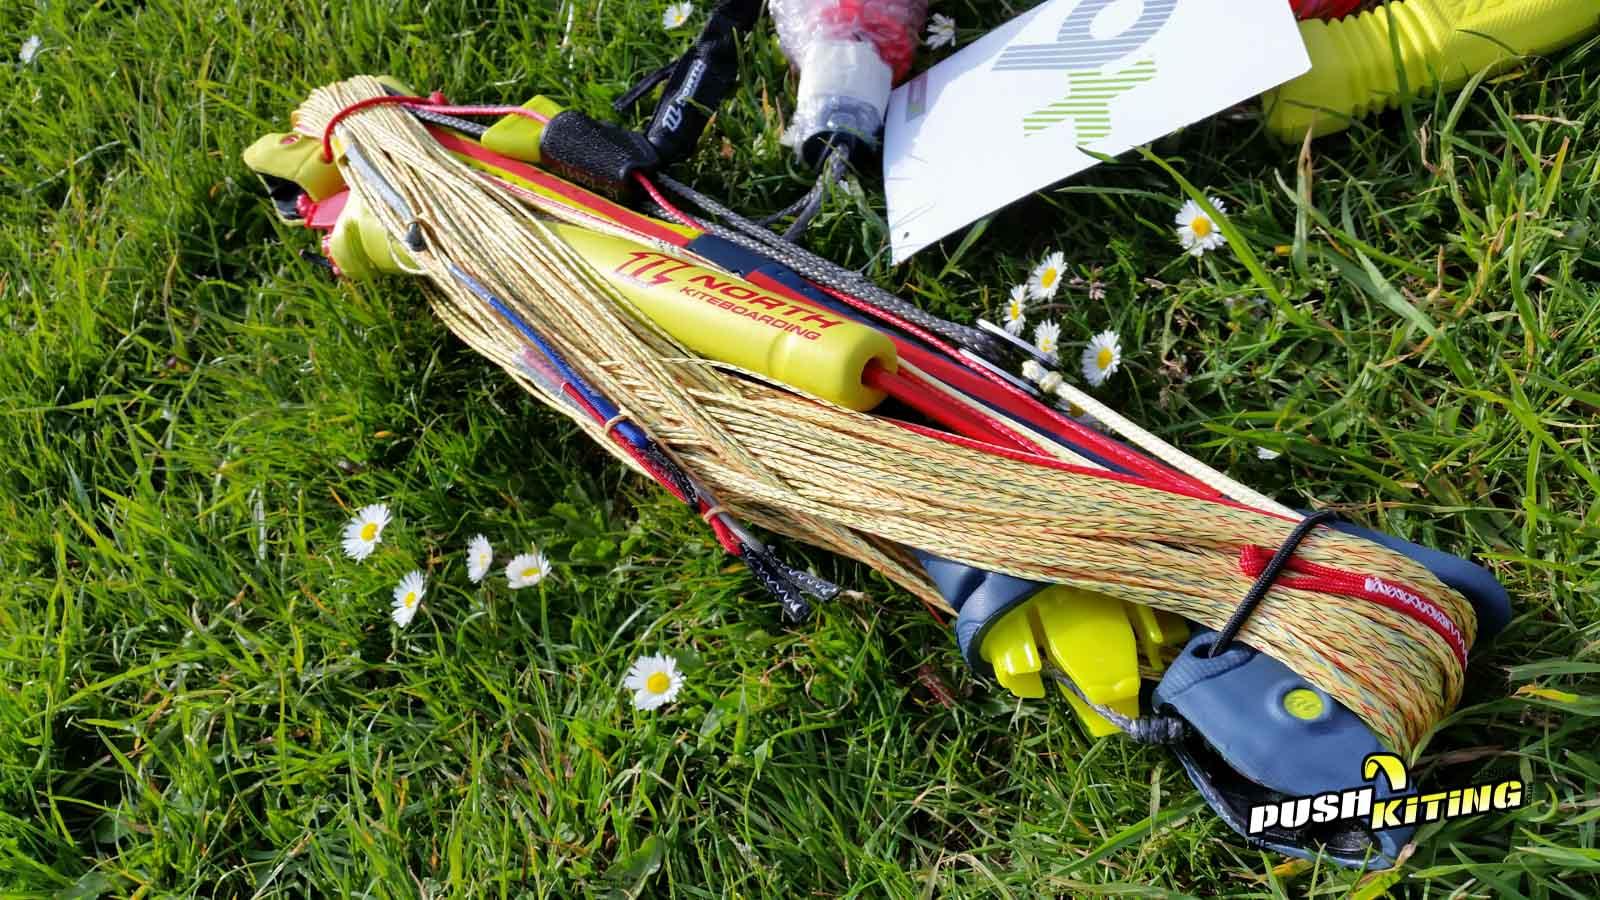 Kites for sale